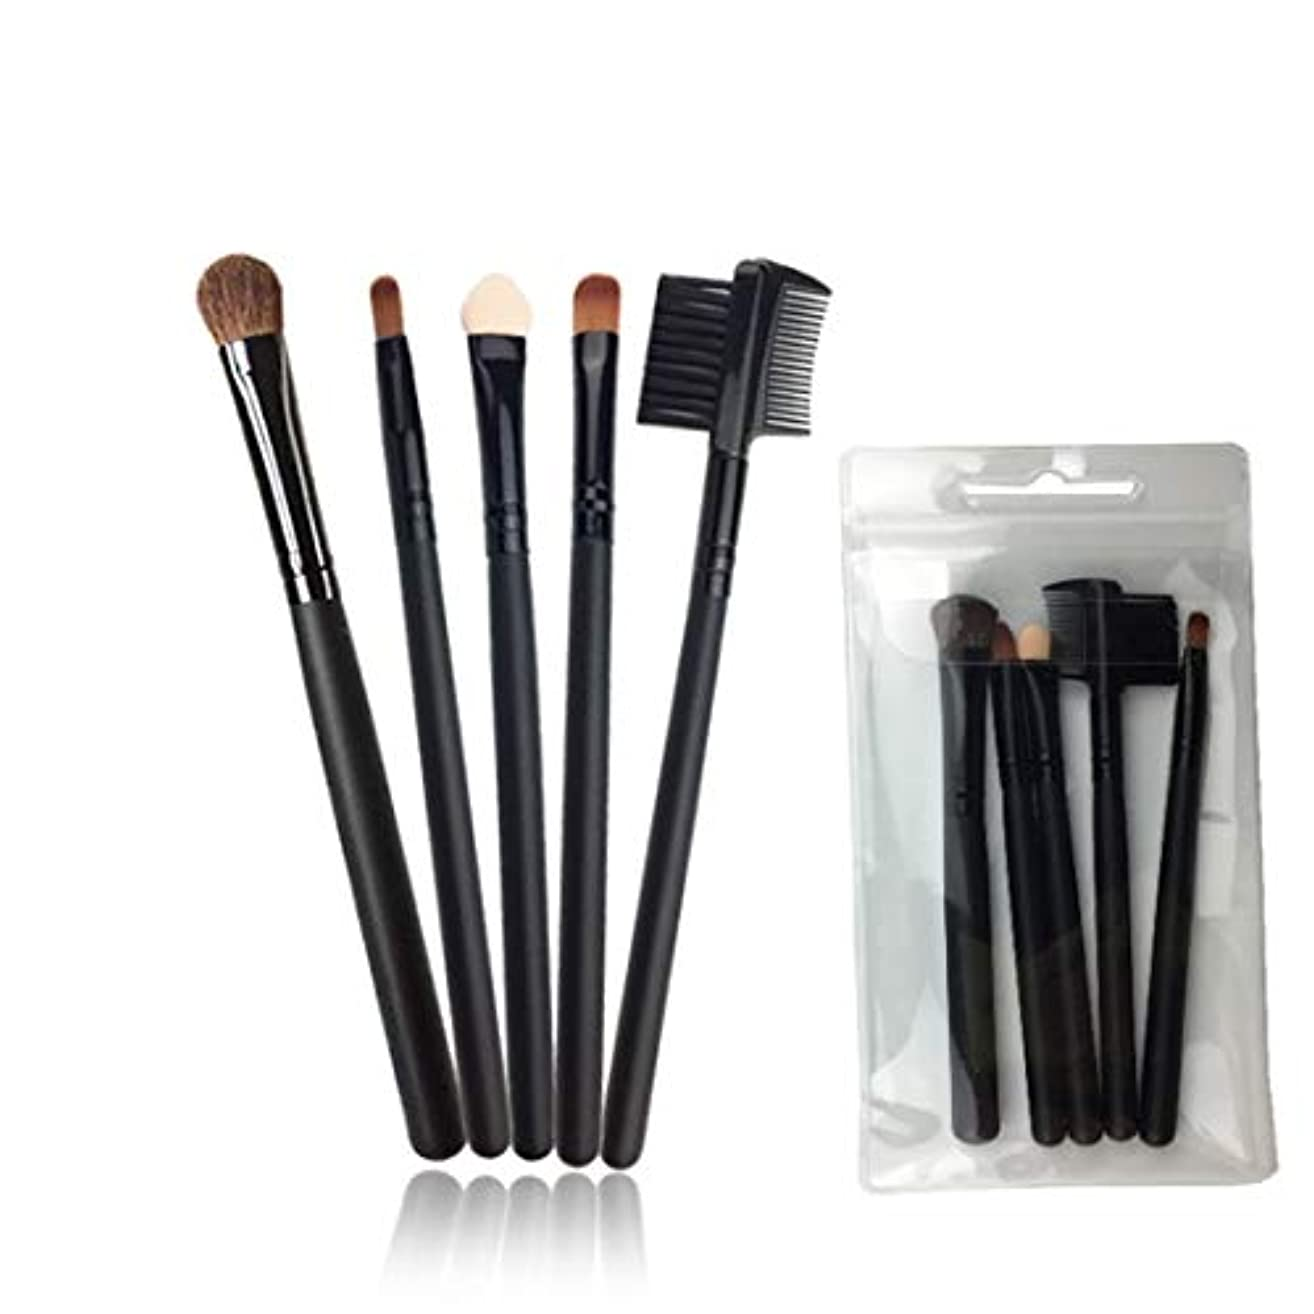 Makeup brushes 黒、旅行ポータブルミニスカートアイメイクメイクツールメイクブラシセット用5メイクブラシ suits (Color : Black)